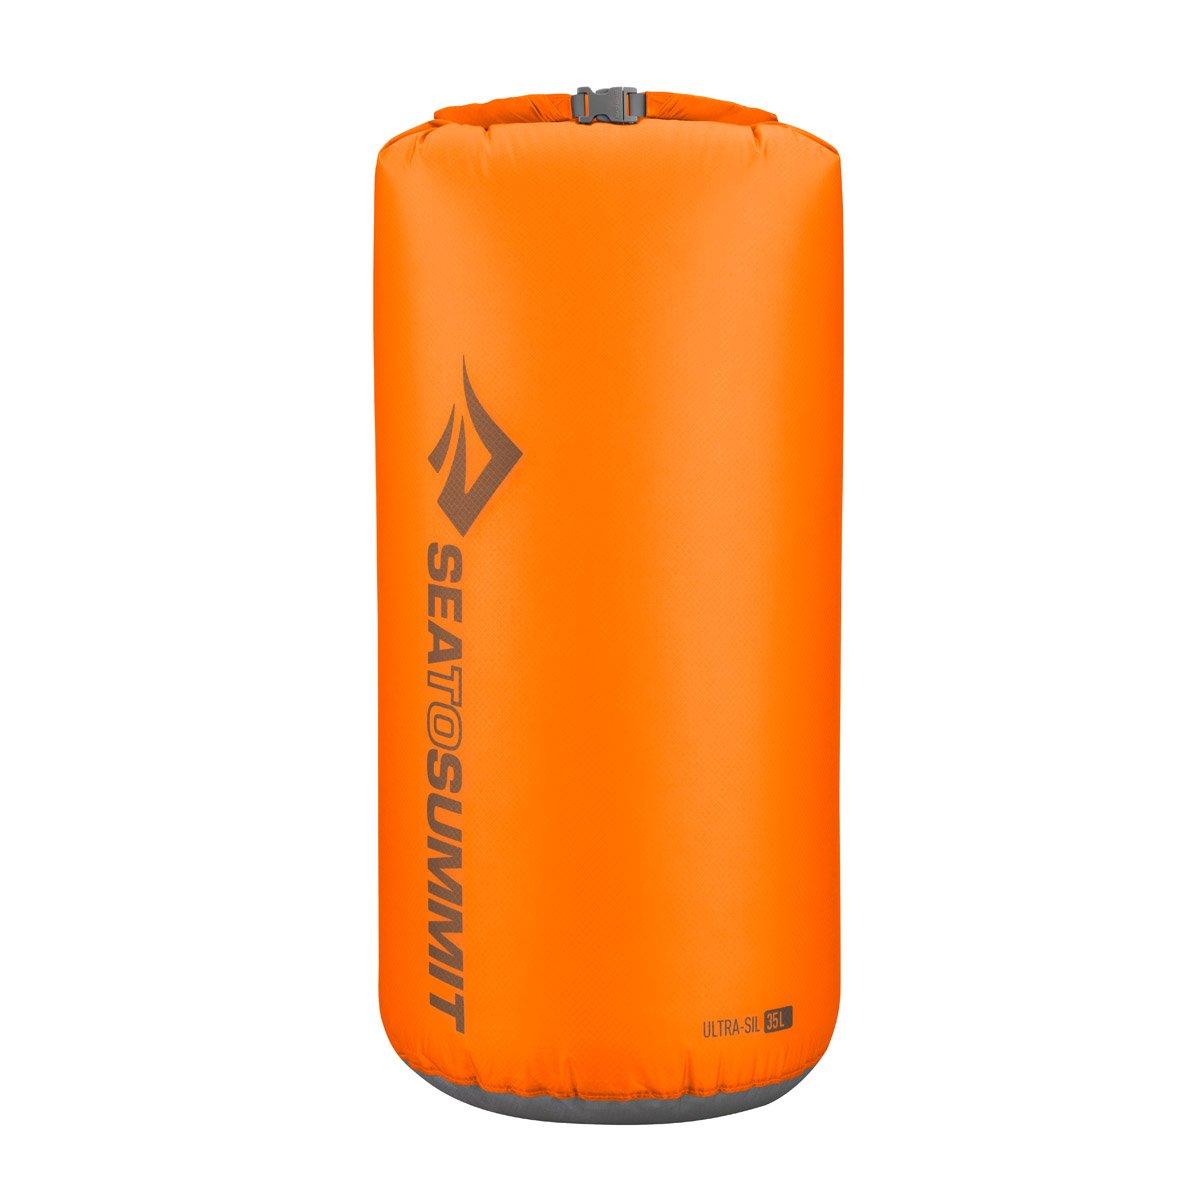 Sea to Summit Ultra-Sil Dry Sack, Orange, 35 Liter by Sea to Summit